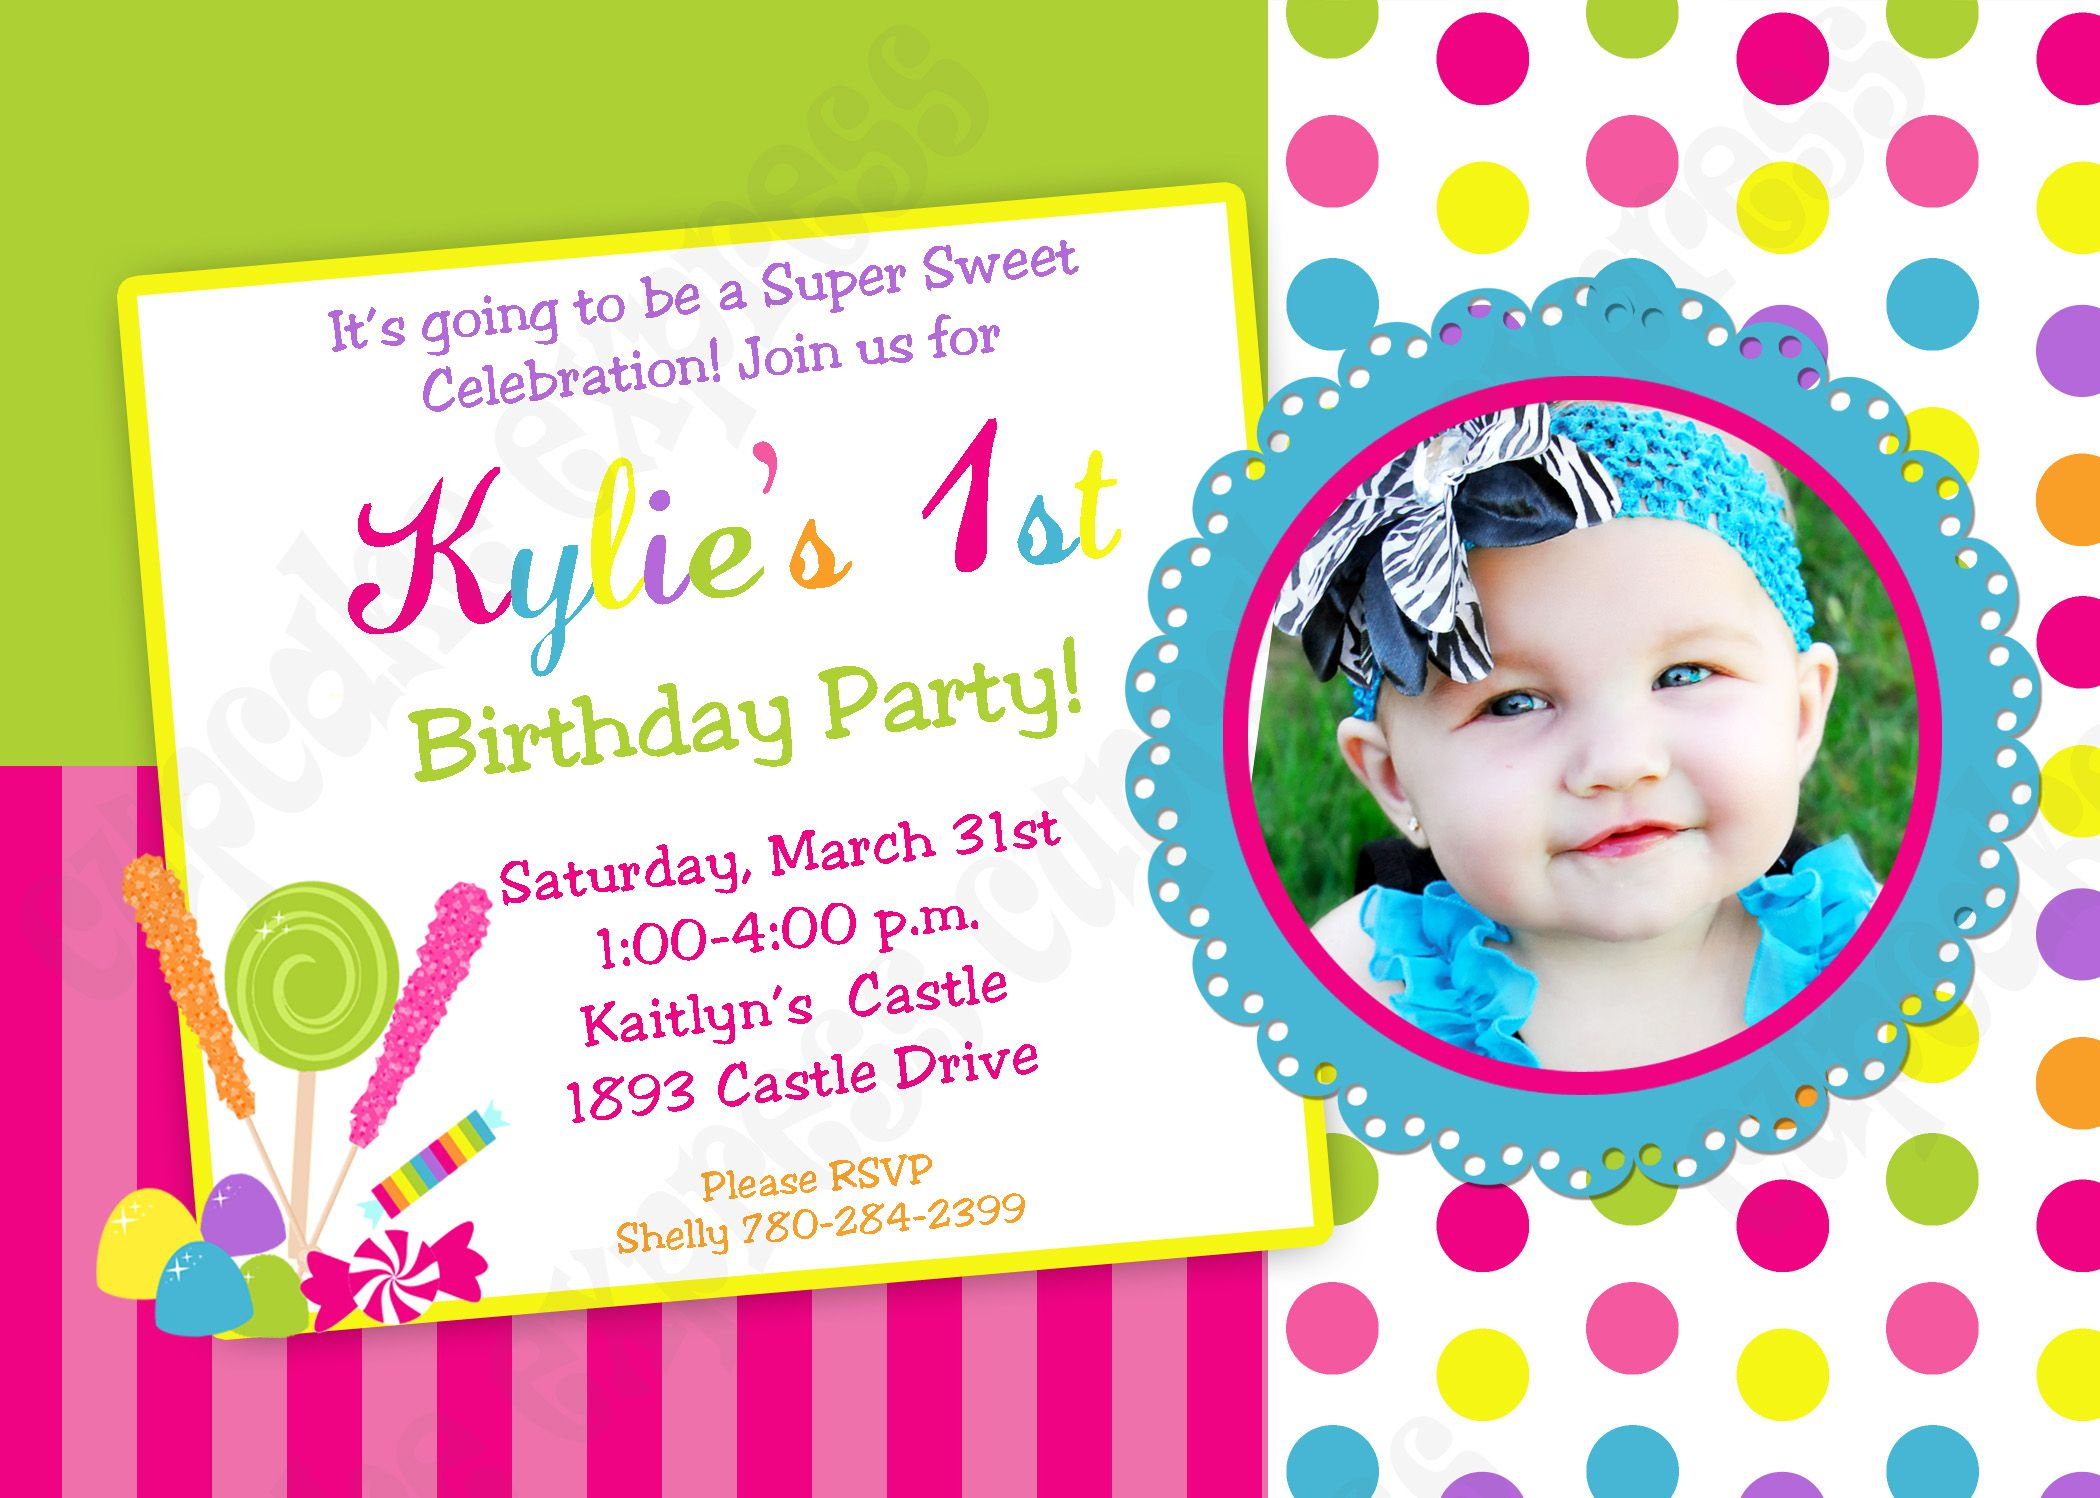 candy shoppe personalized photo birthday invitation sweet shop